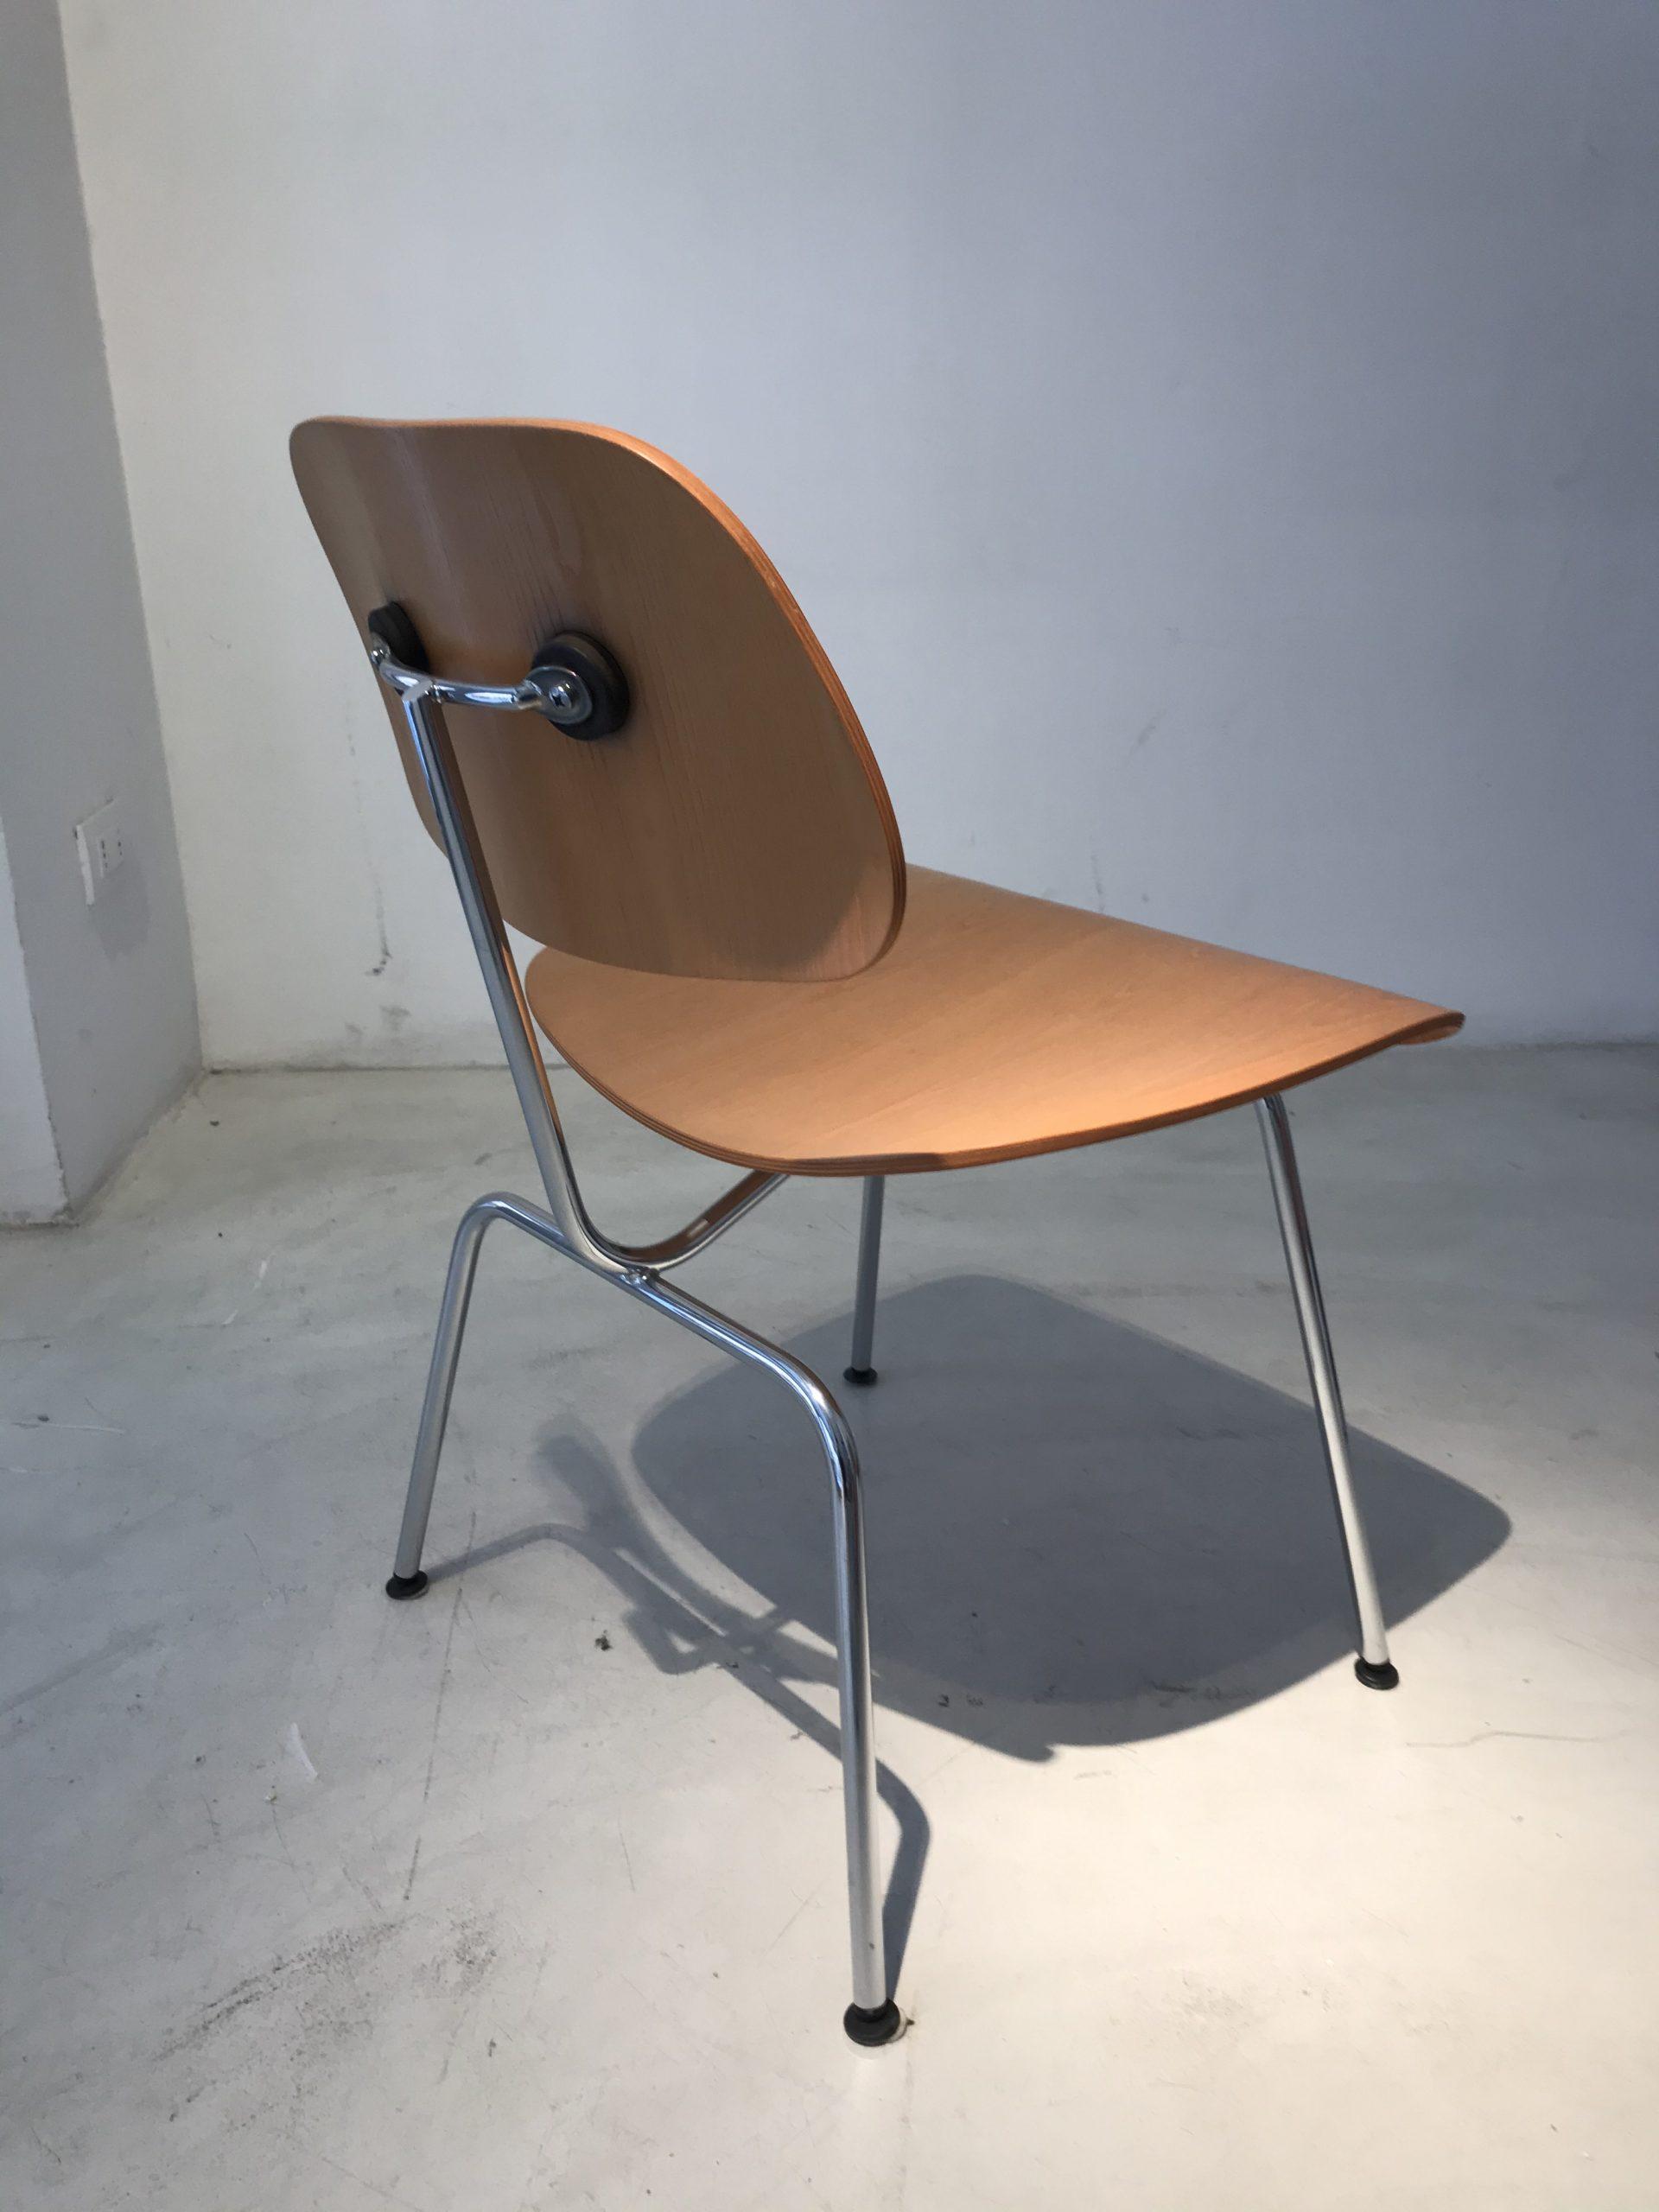 Vitra Chair Eames original Plywood